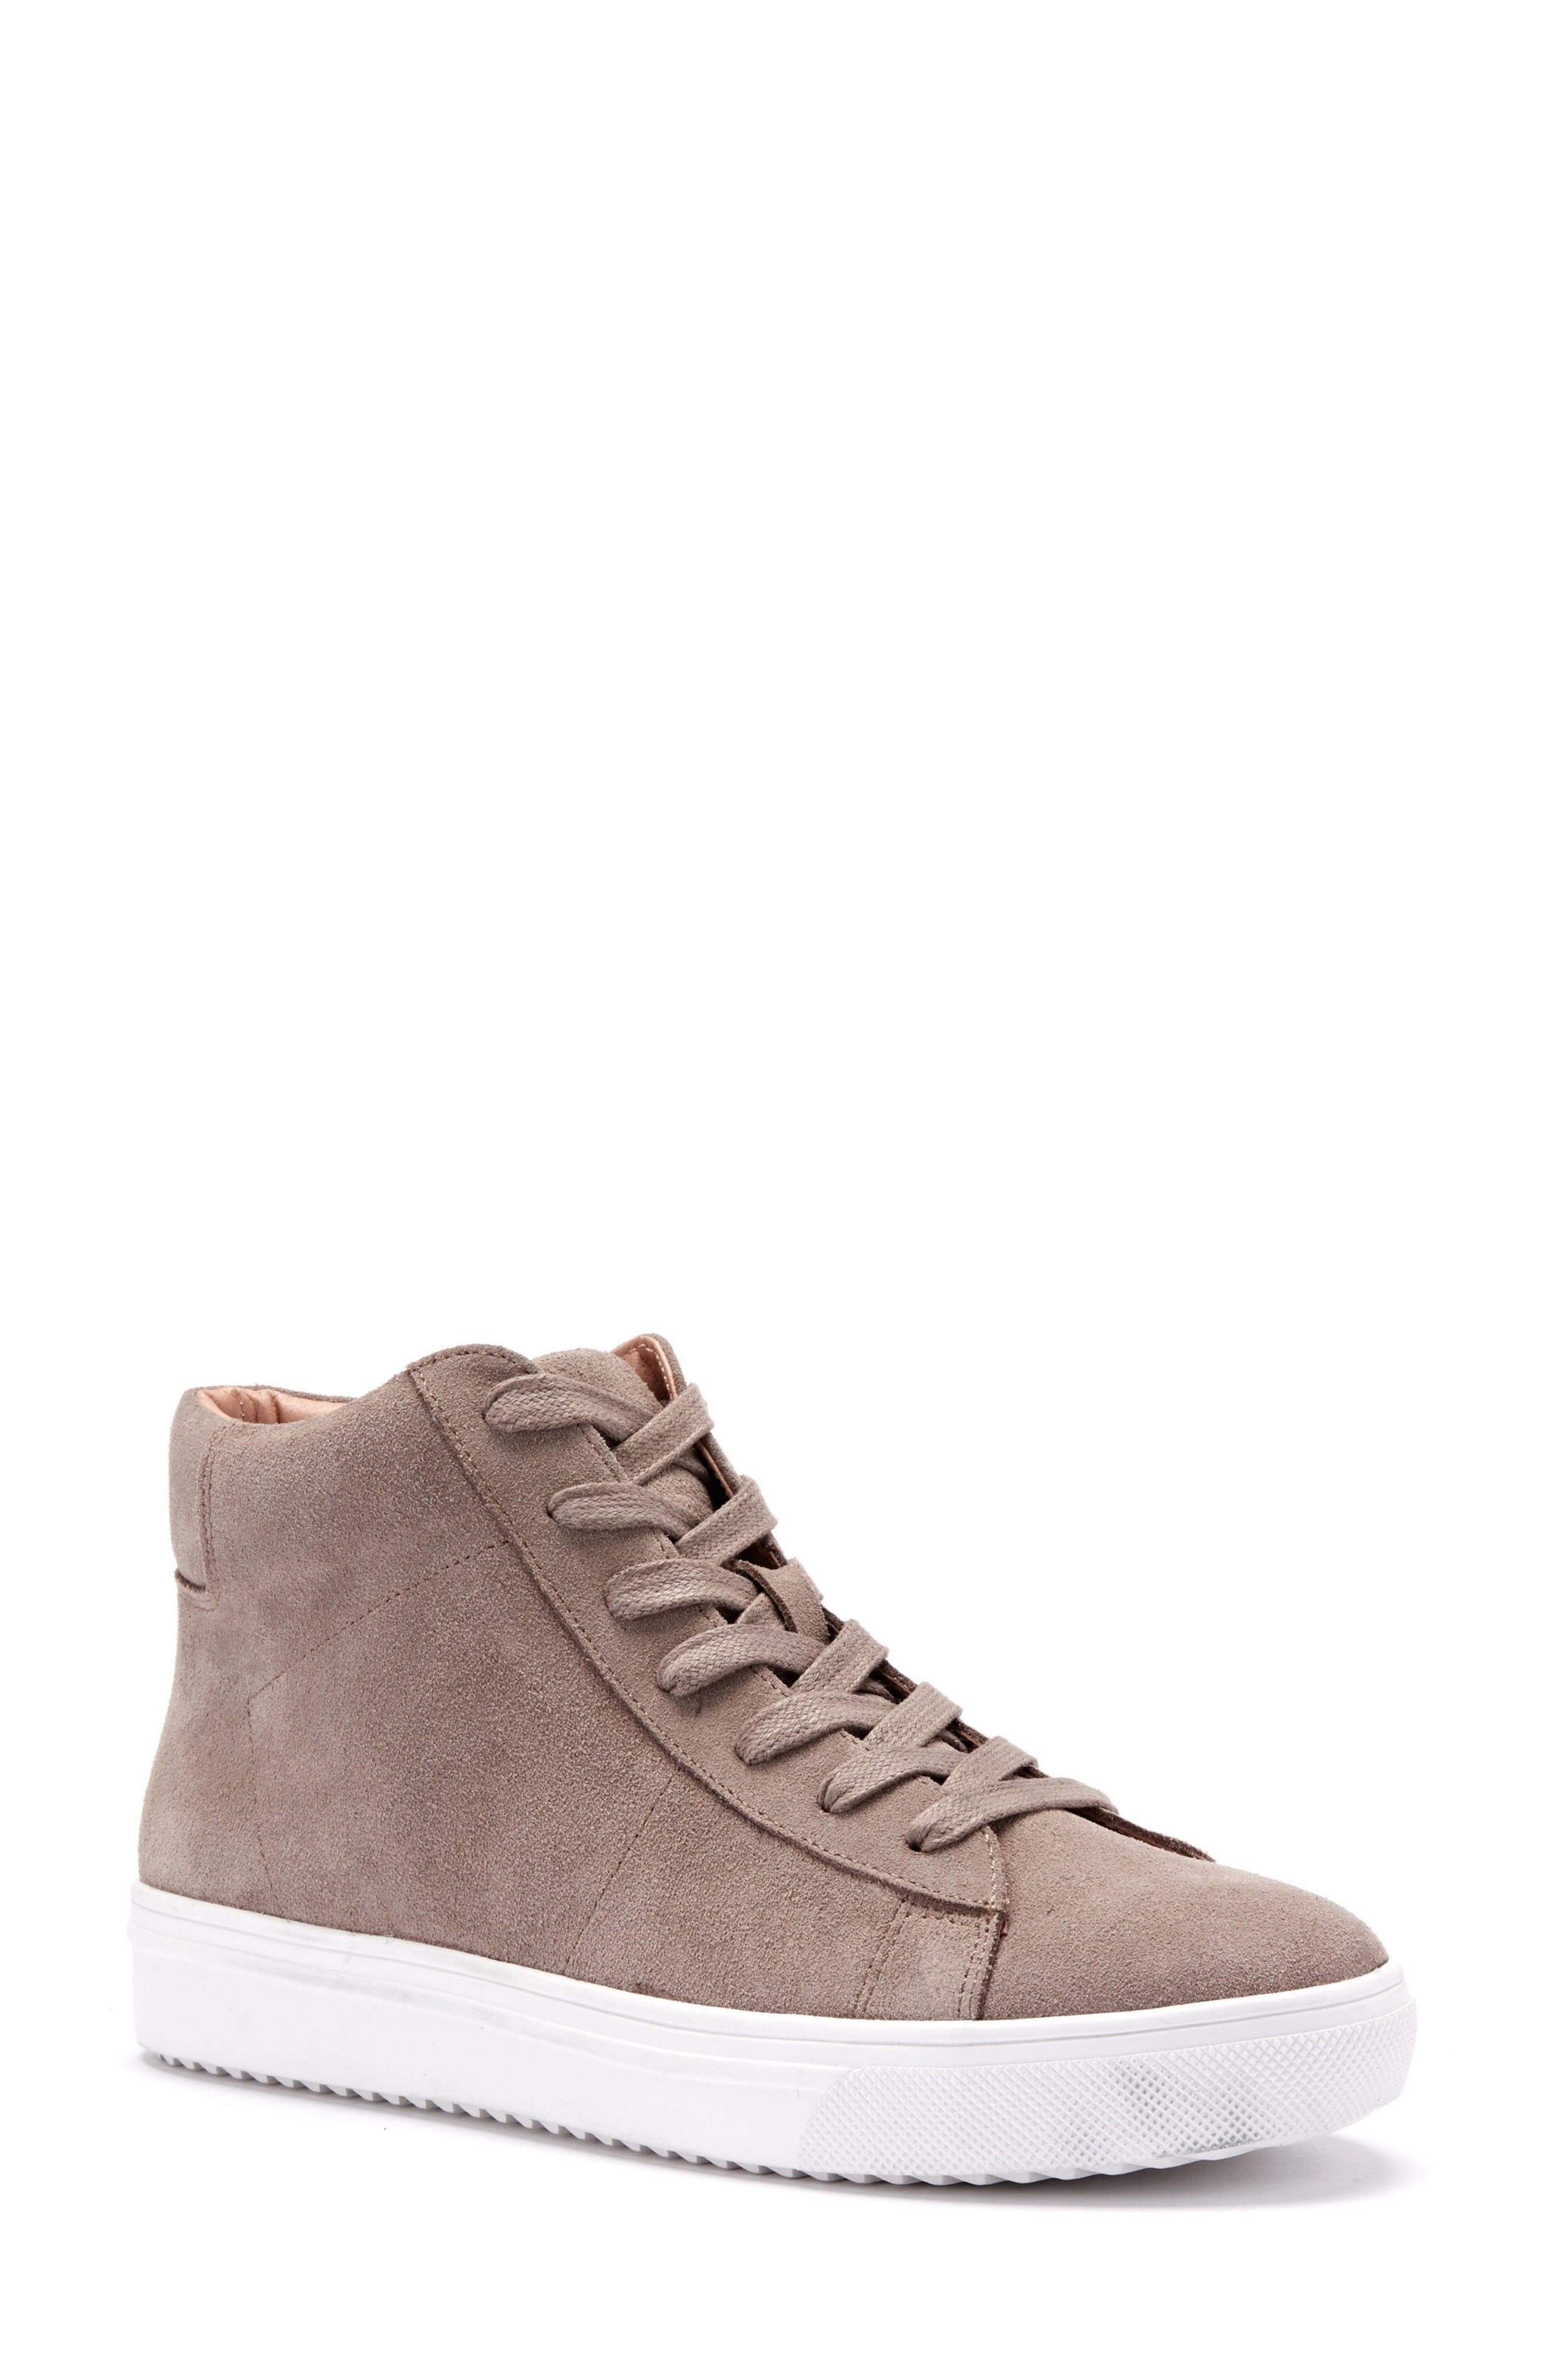 Blondo Jax Waterproof High Top Sneaker (Women)